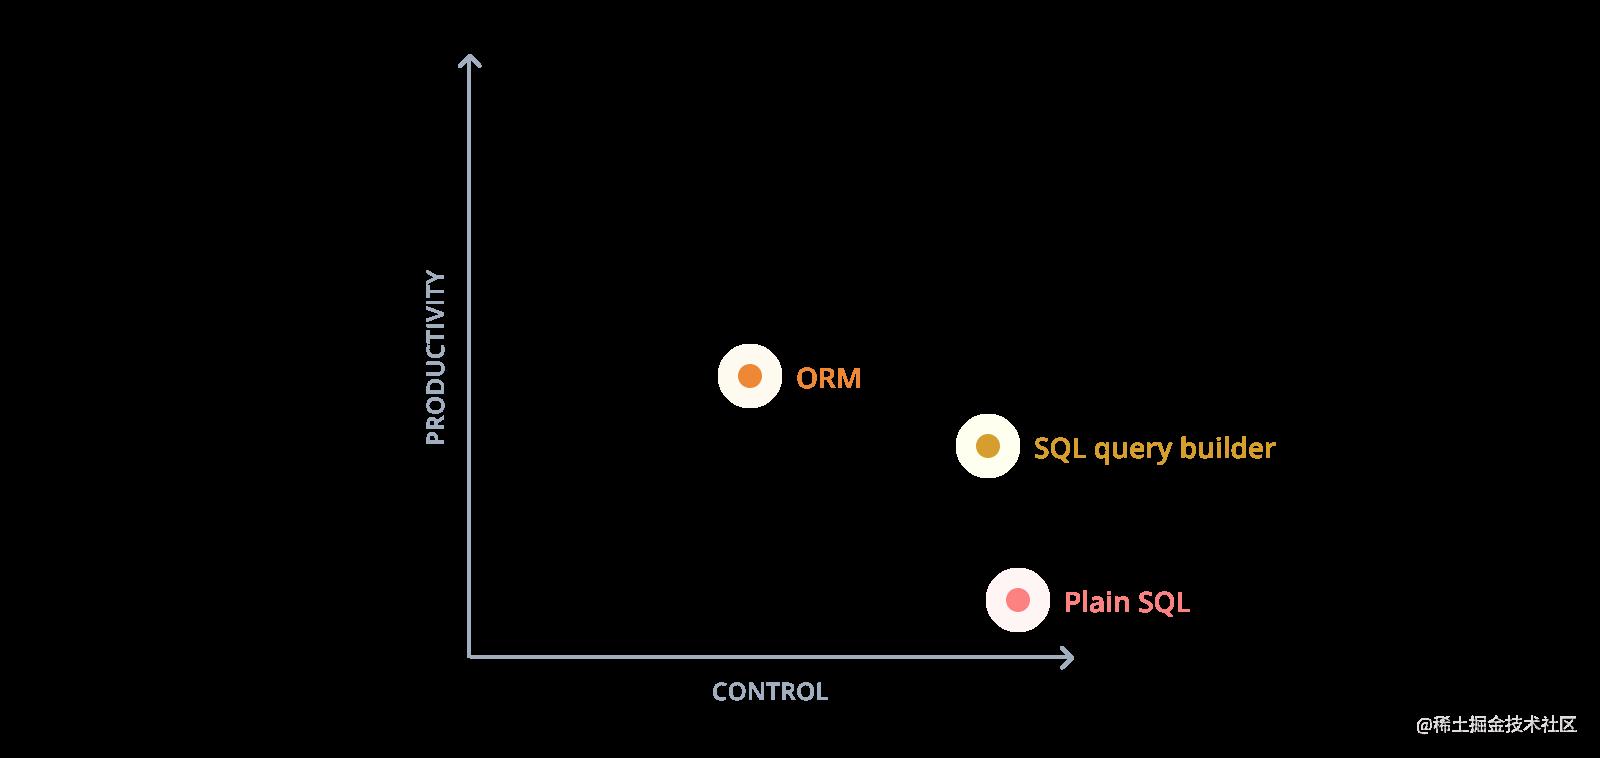 ORM、SQL 查询构建器和 SQL 中的生产力与控制